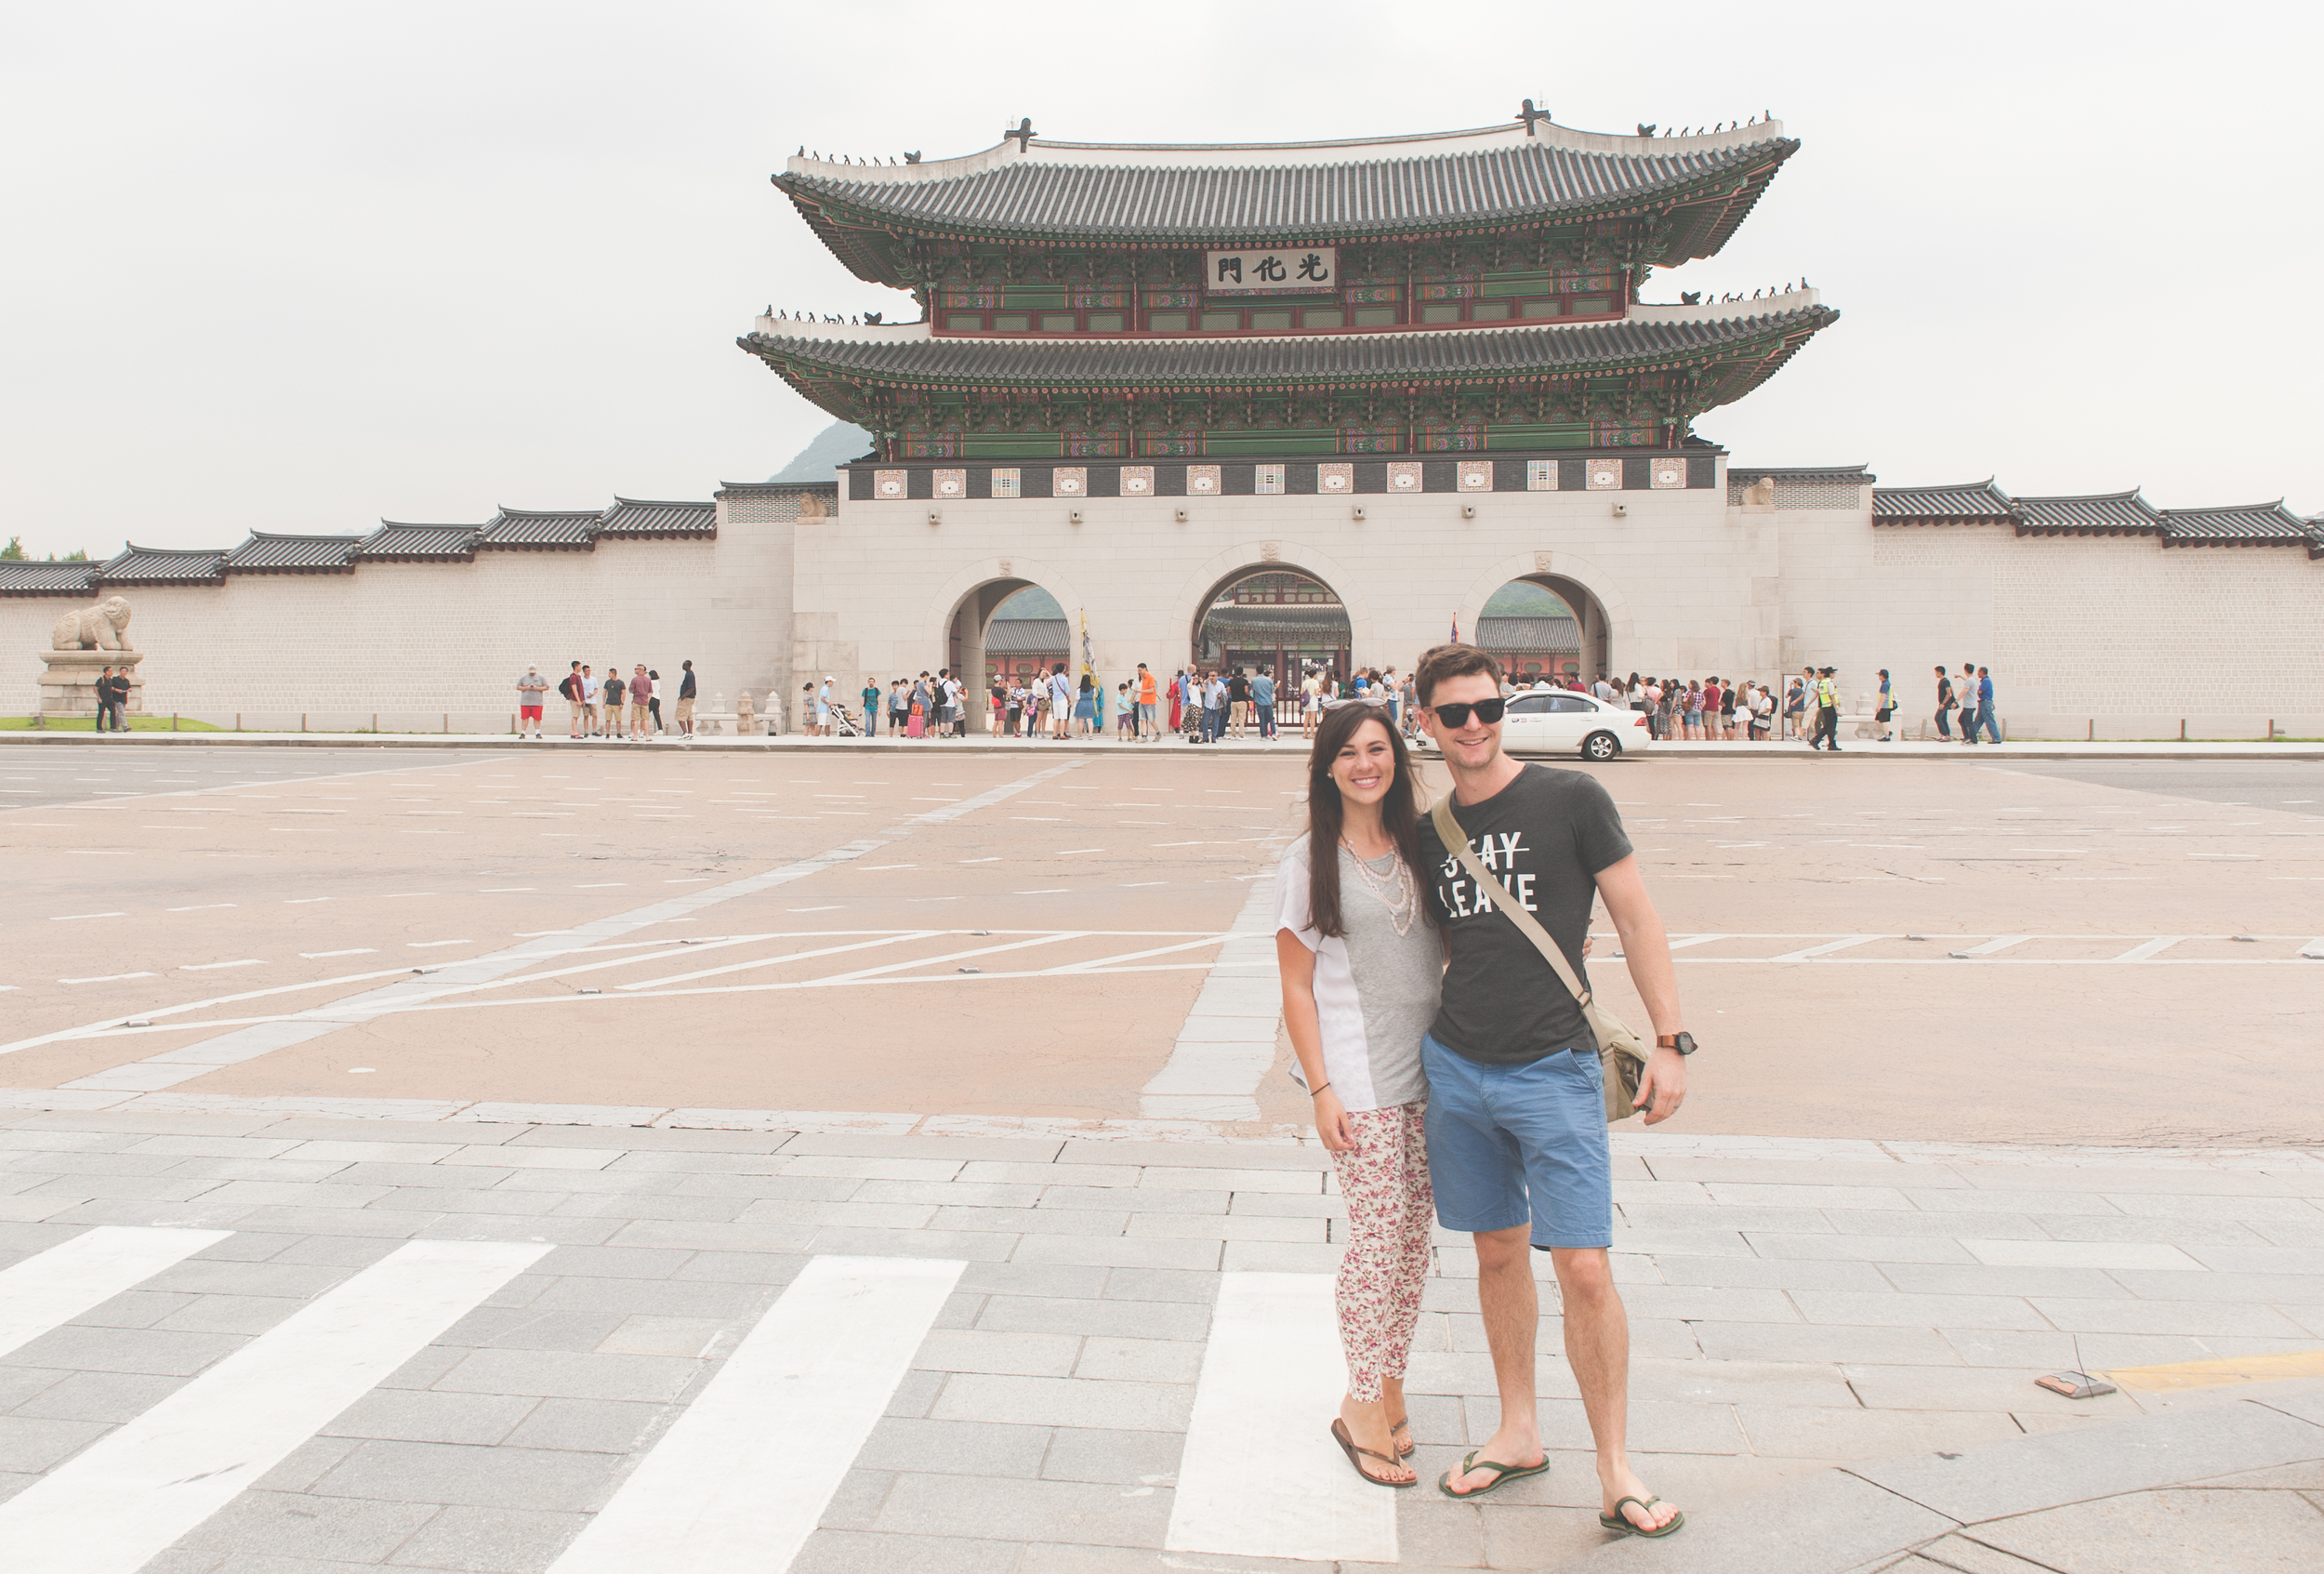 Farmboy and citygirl leave Korea south africans in South korea